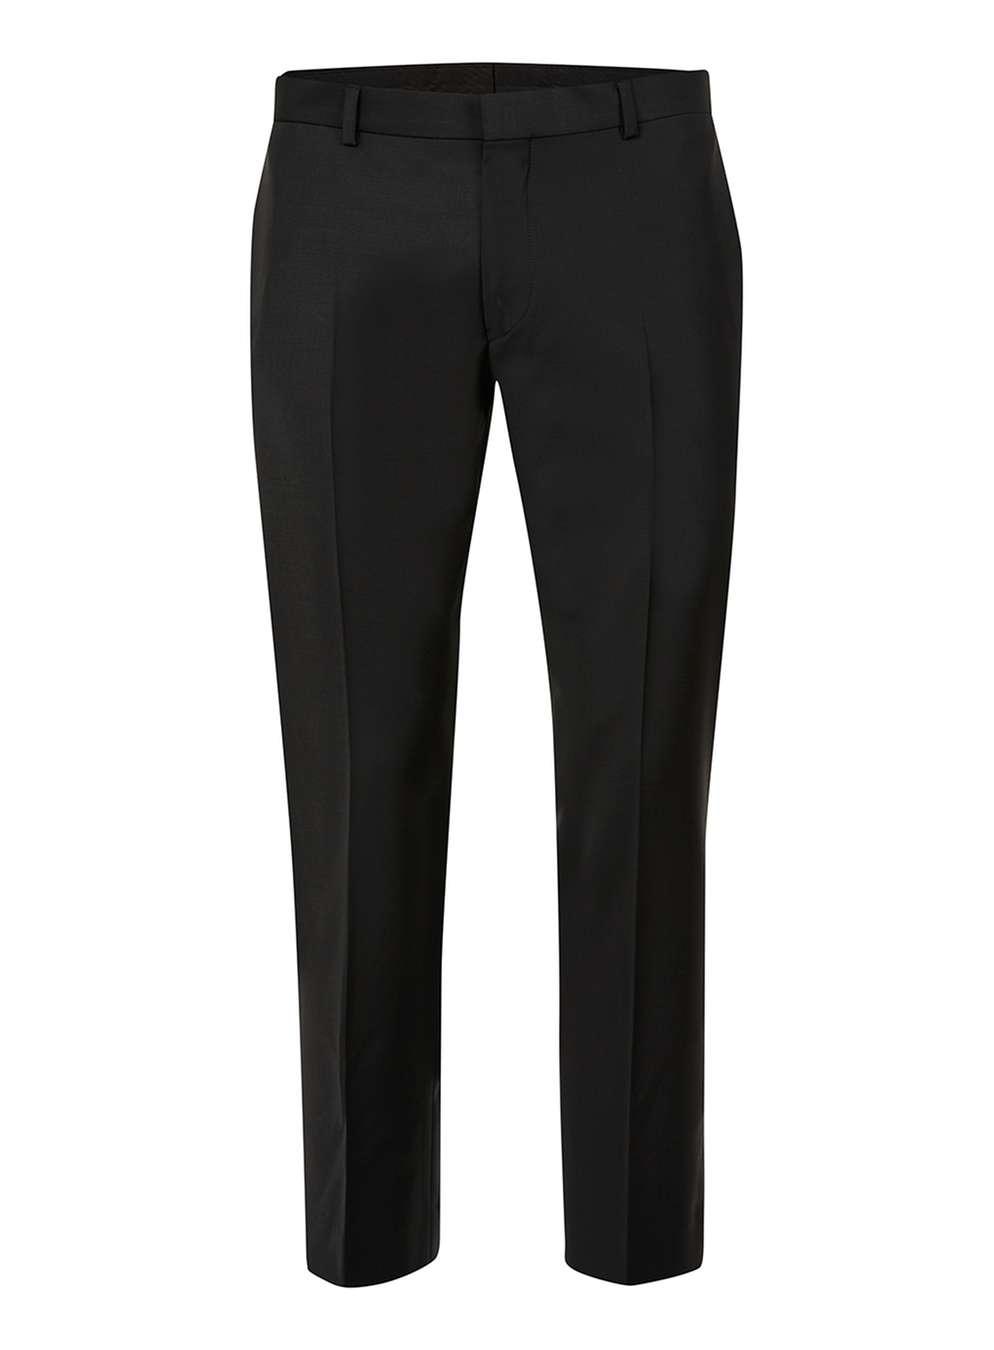 TOPMAN PREMIUM Black Wool Blend Cropped Trousers , £45